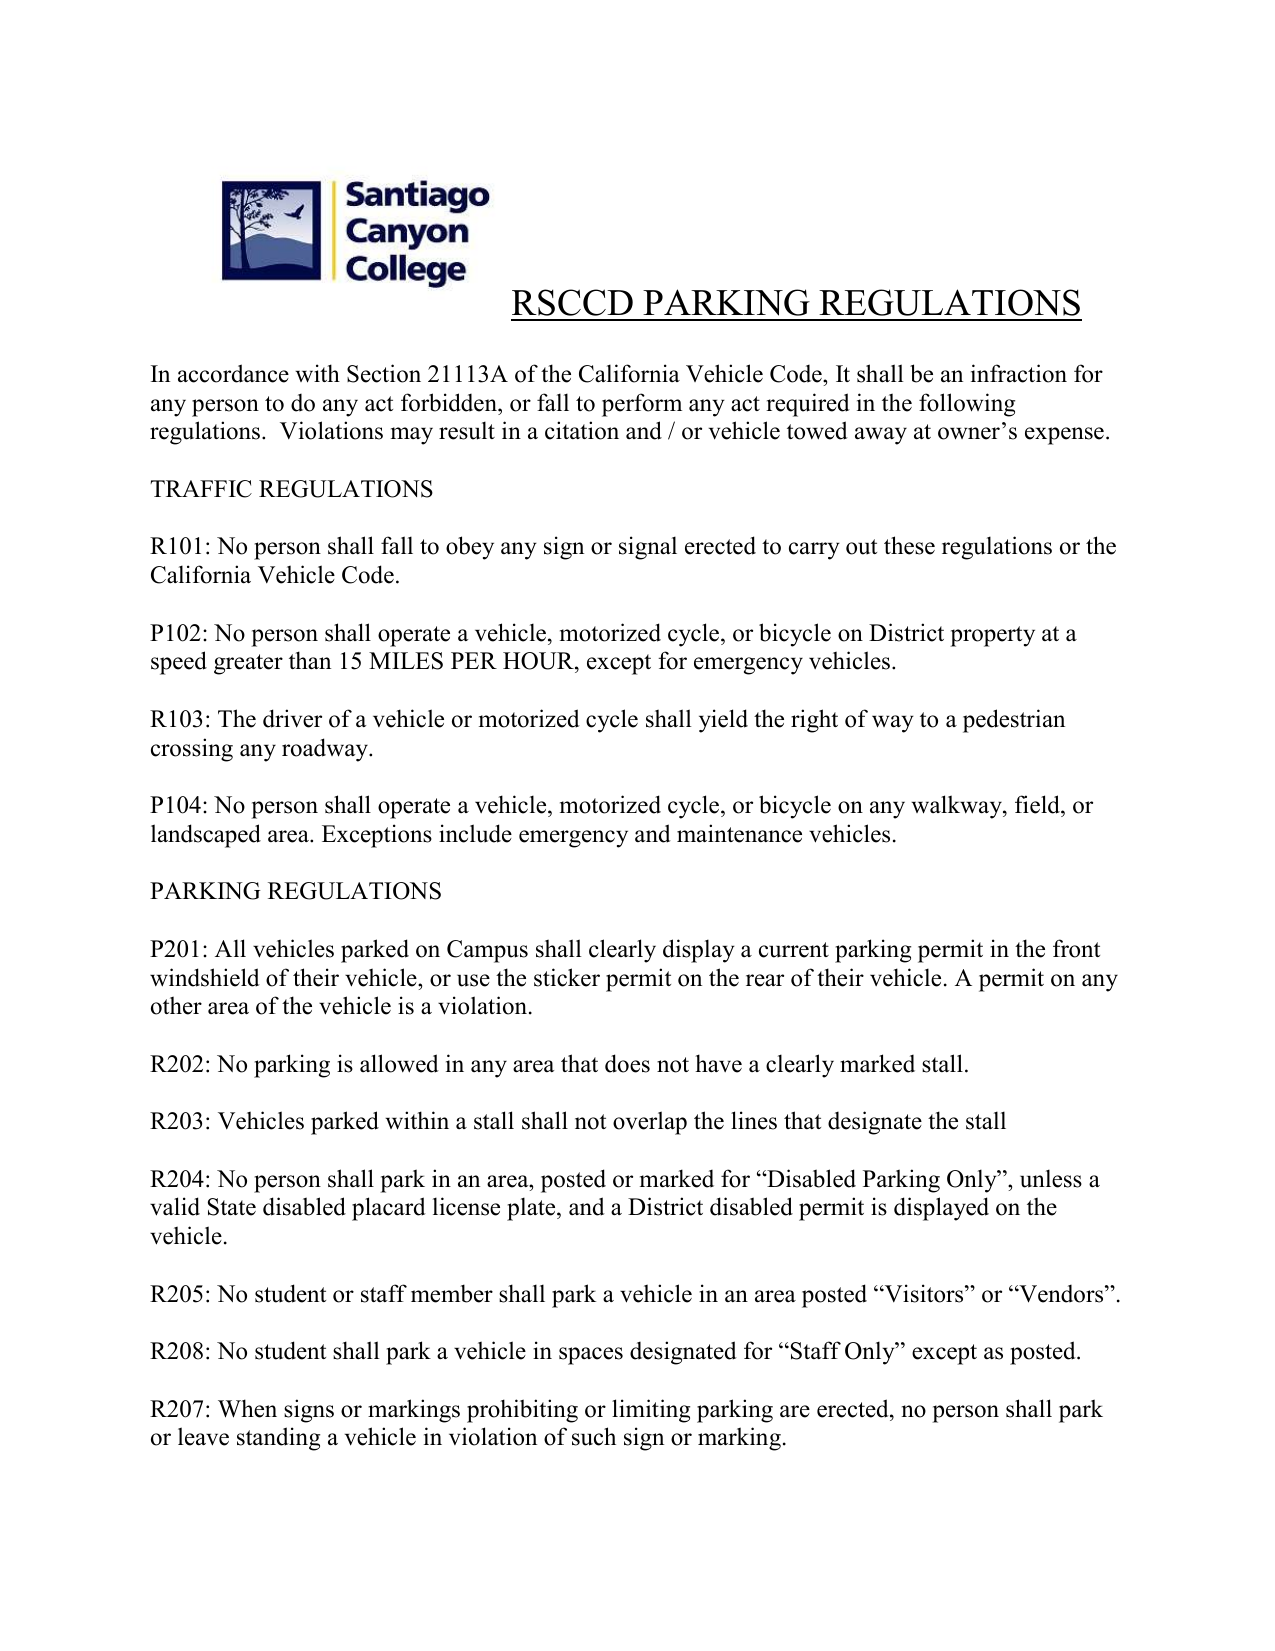 SCC Parking Regulations - Santiago Canyon College